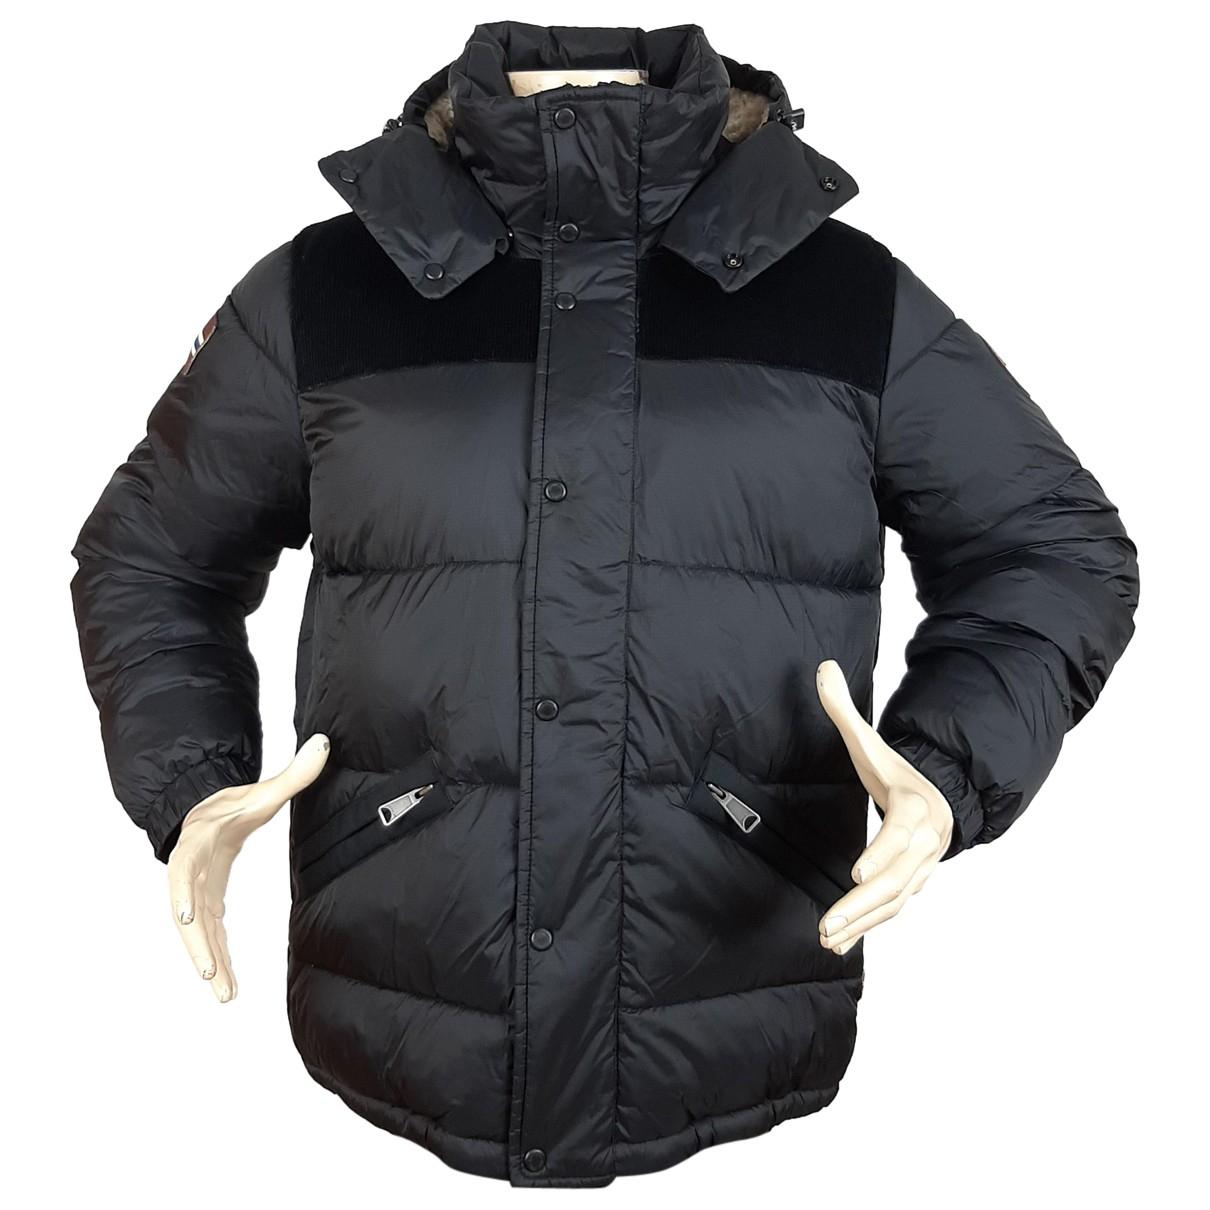 Napapijri N Black jacket  for Men M International